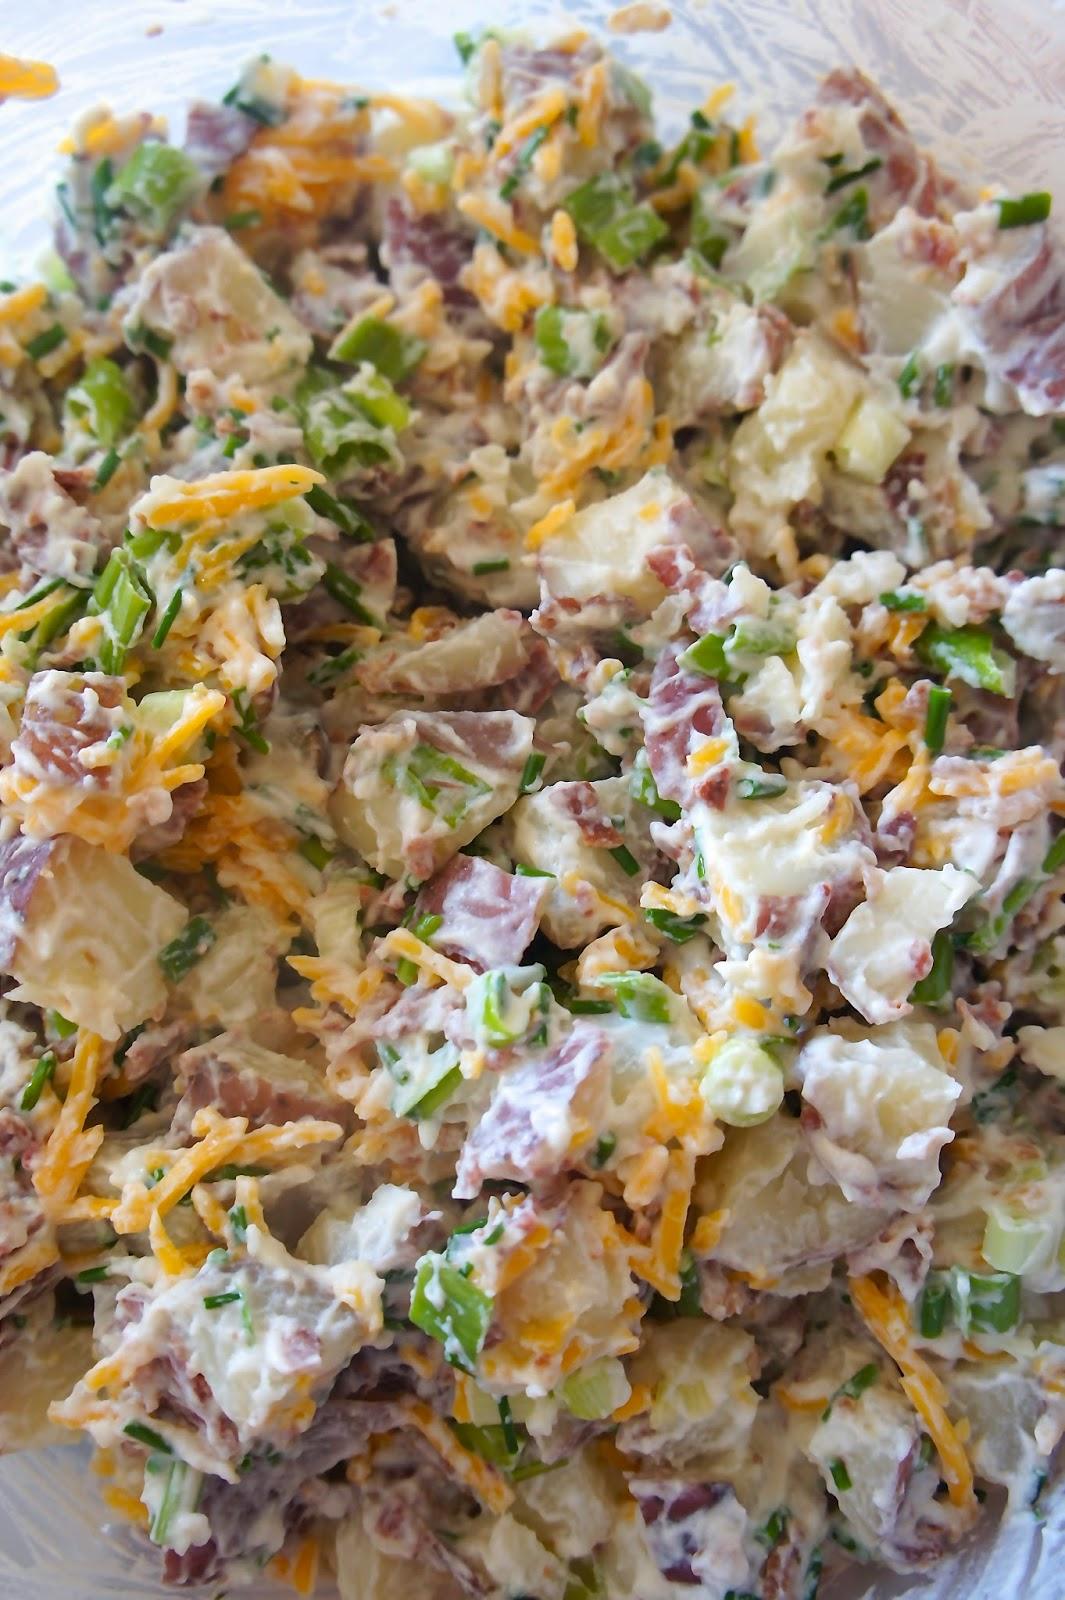 Savory Sweet and Satisfying: Loaded Potato Salad